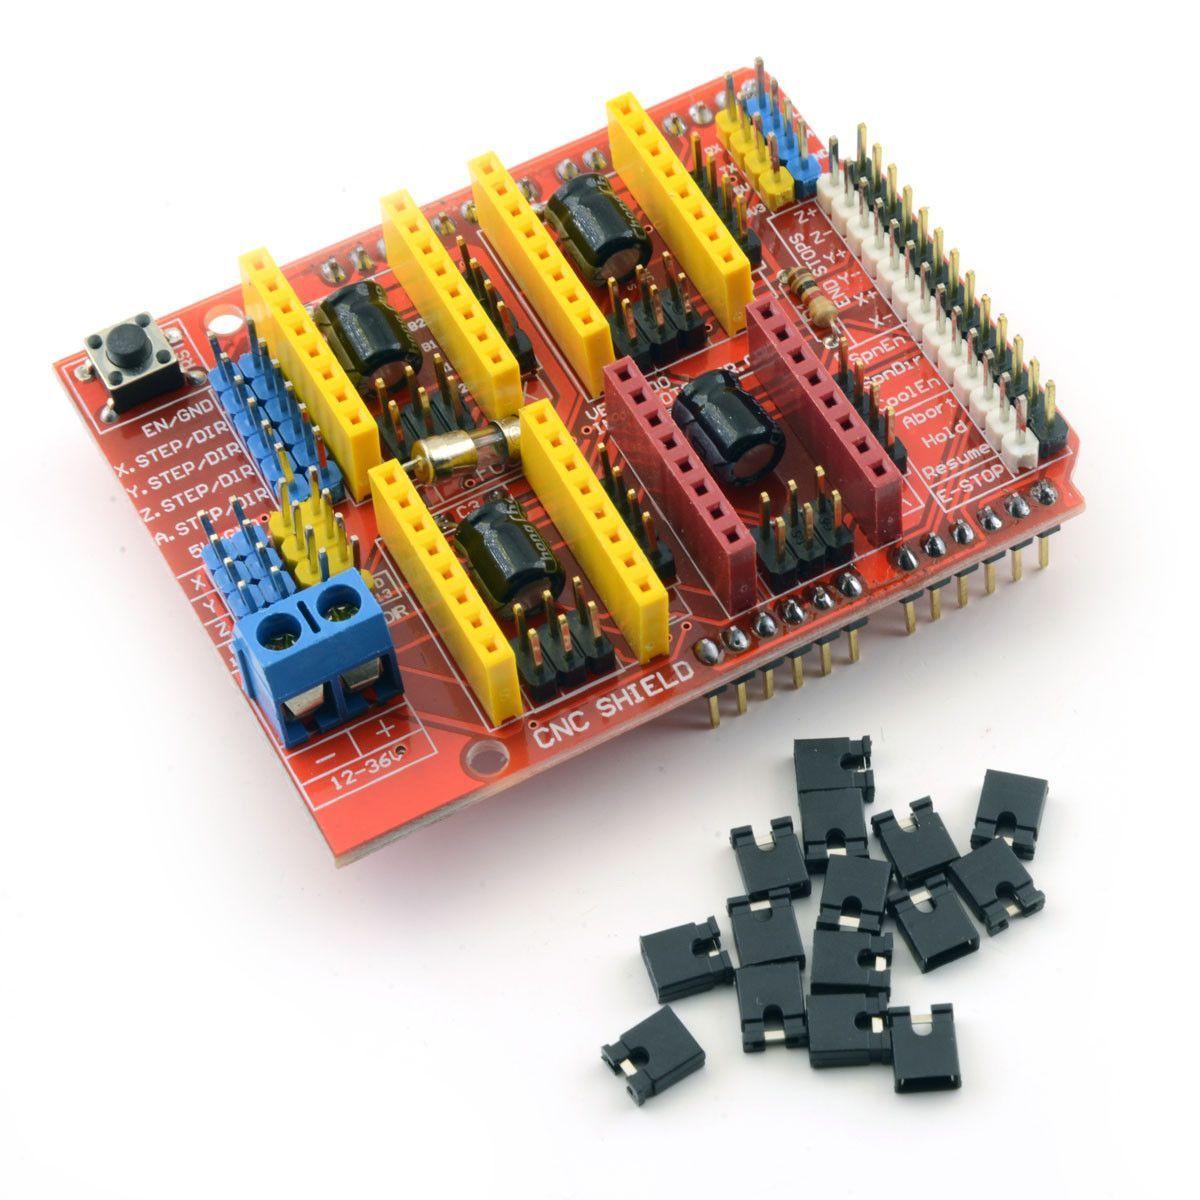 hight resolution of assembled cnc v3 arduino shield for a4988 drv8825 stepsticks router mill robot